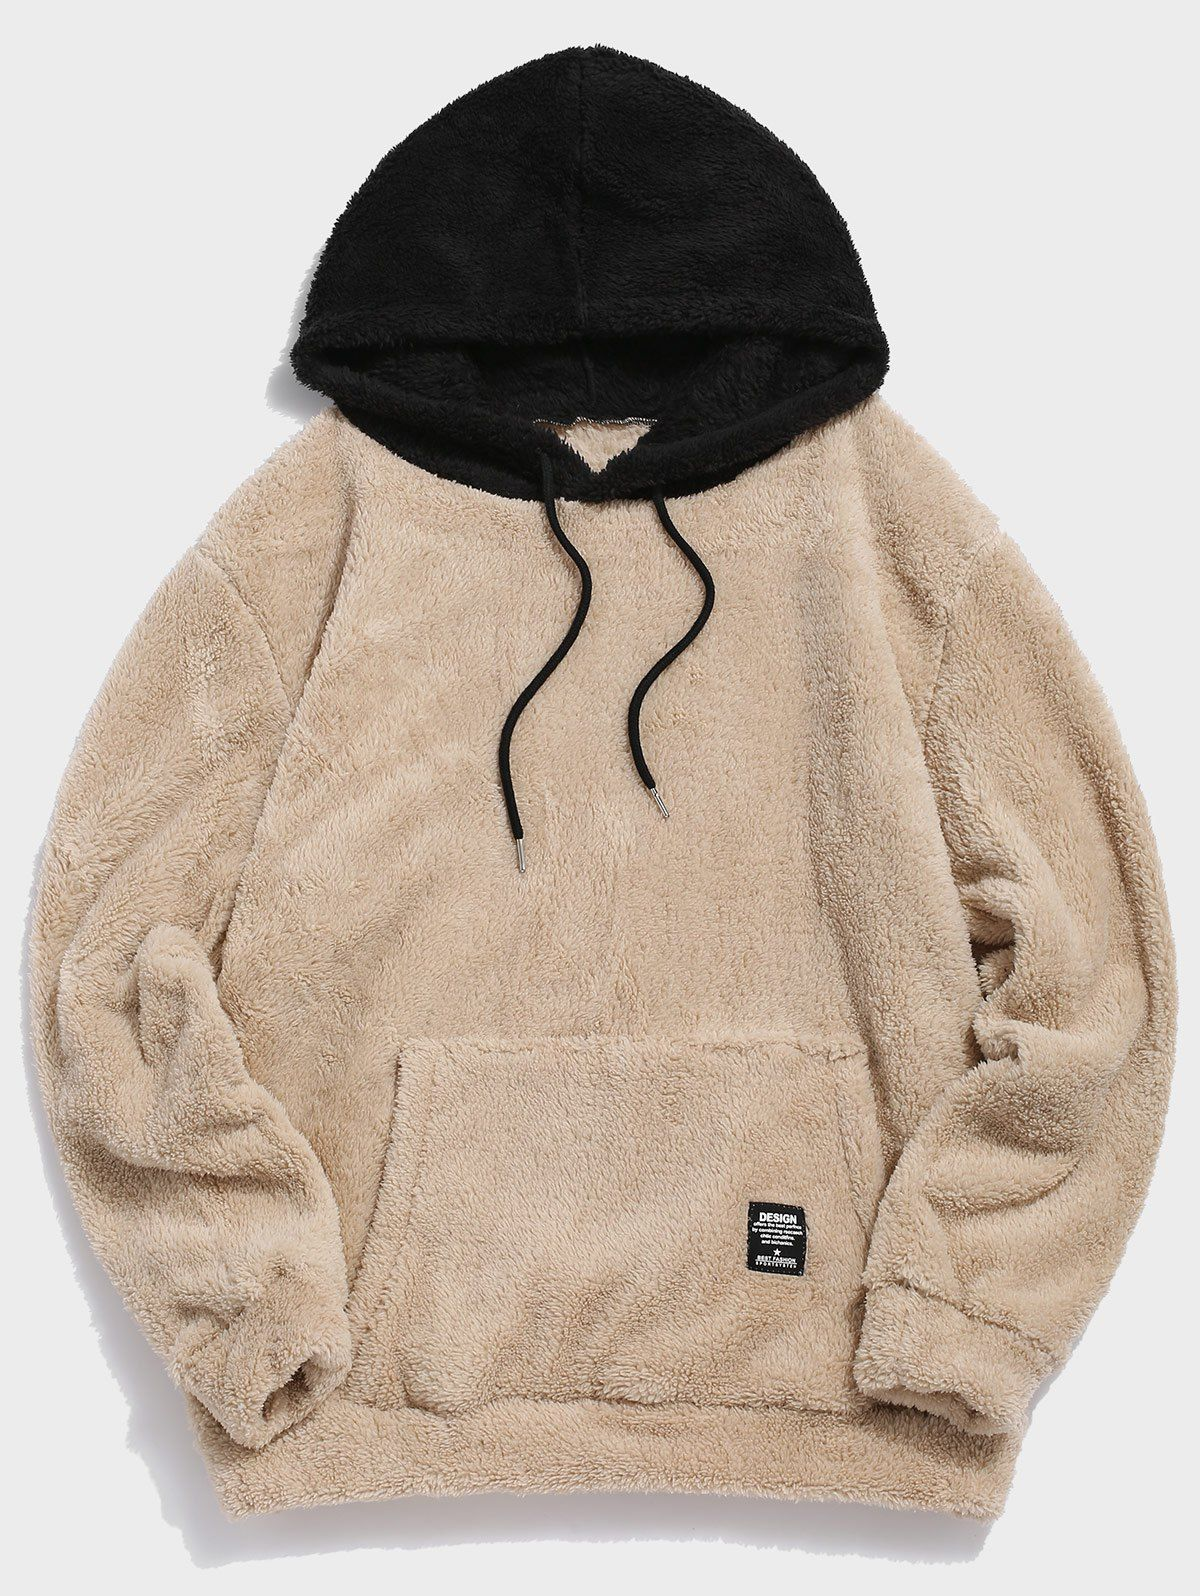 Baggy Sweatshirt Mens